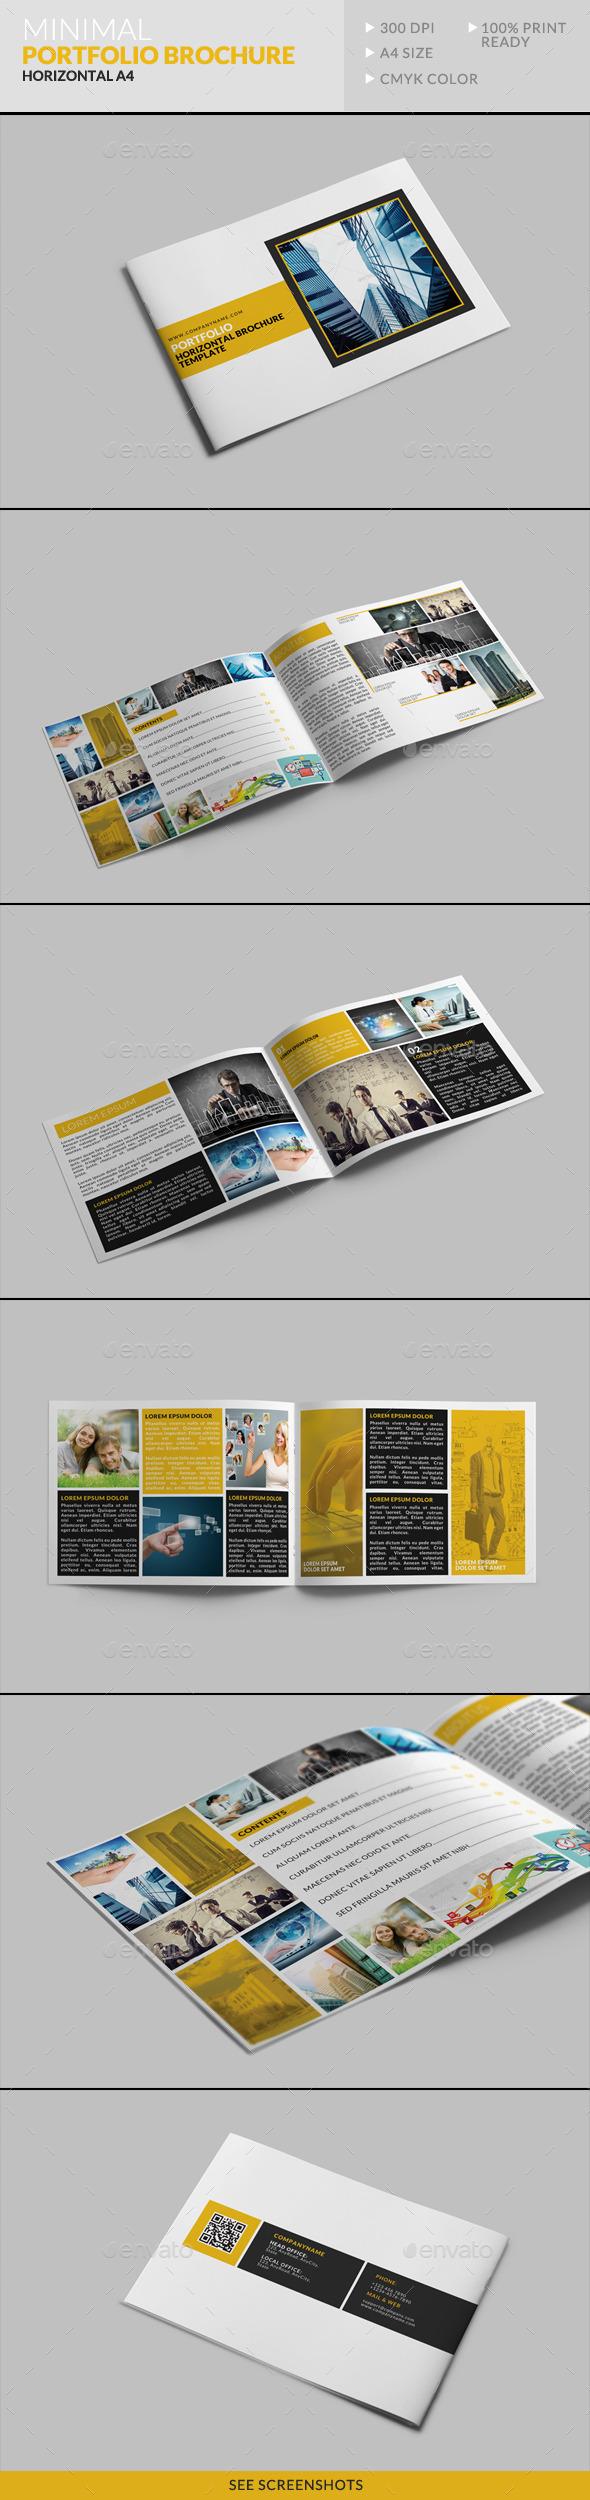 GraphicRiver Minimal Portfolio Brochure Horizontal A4 8864433